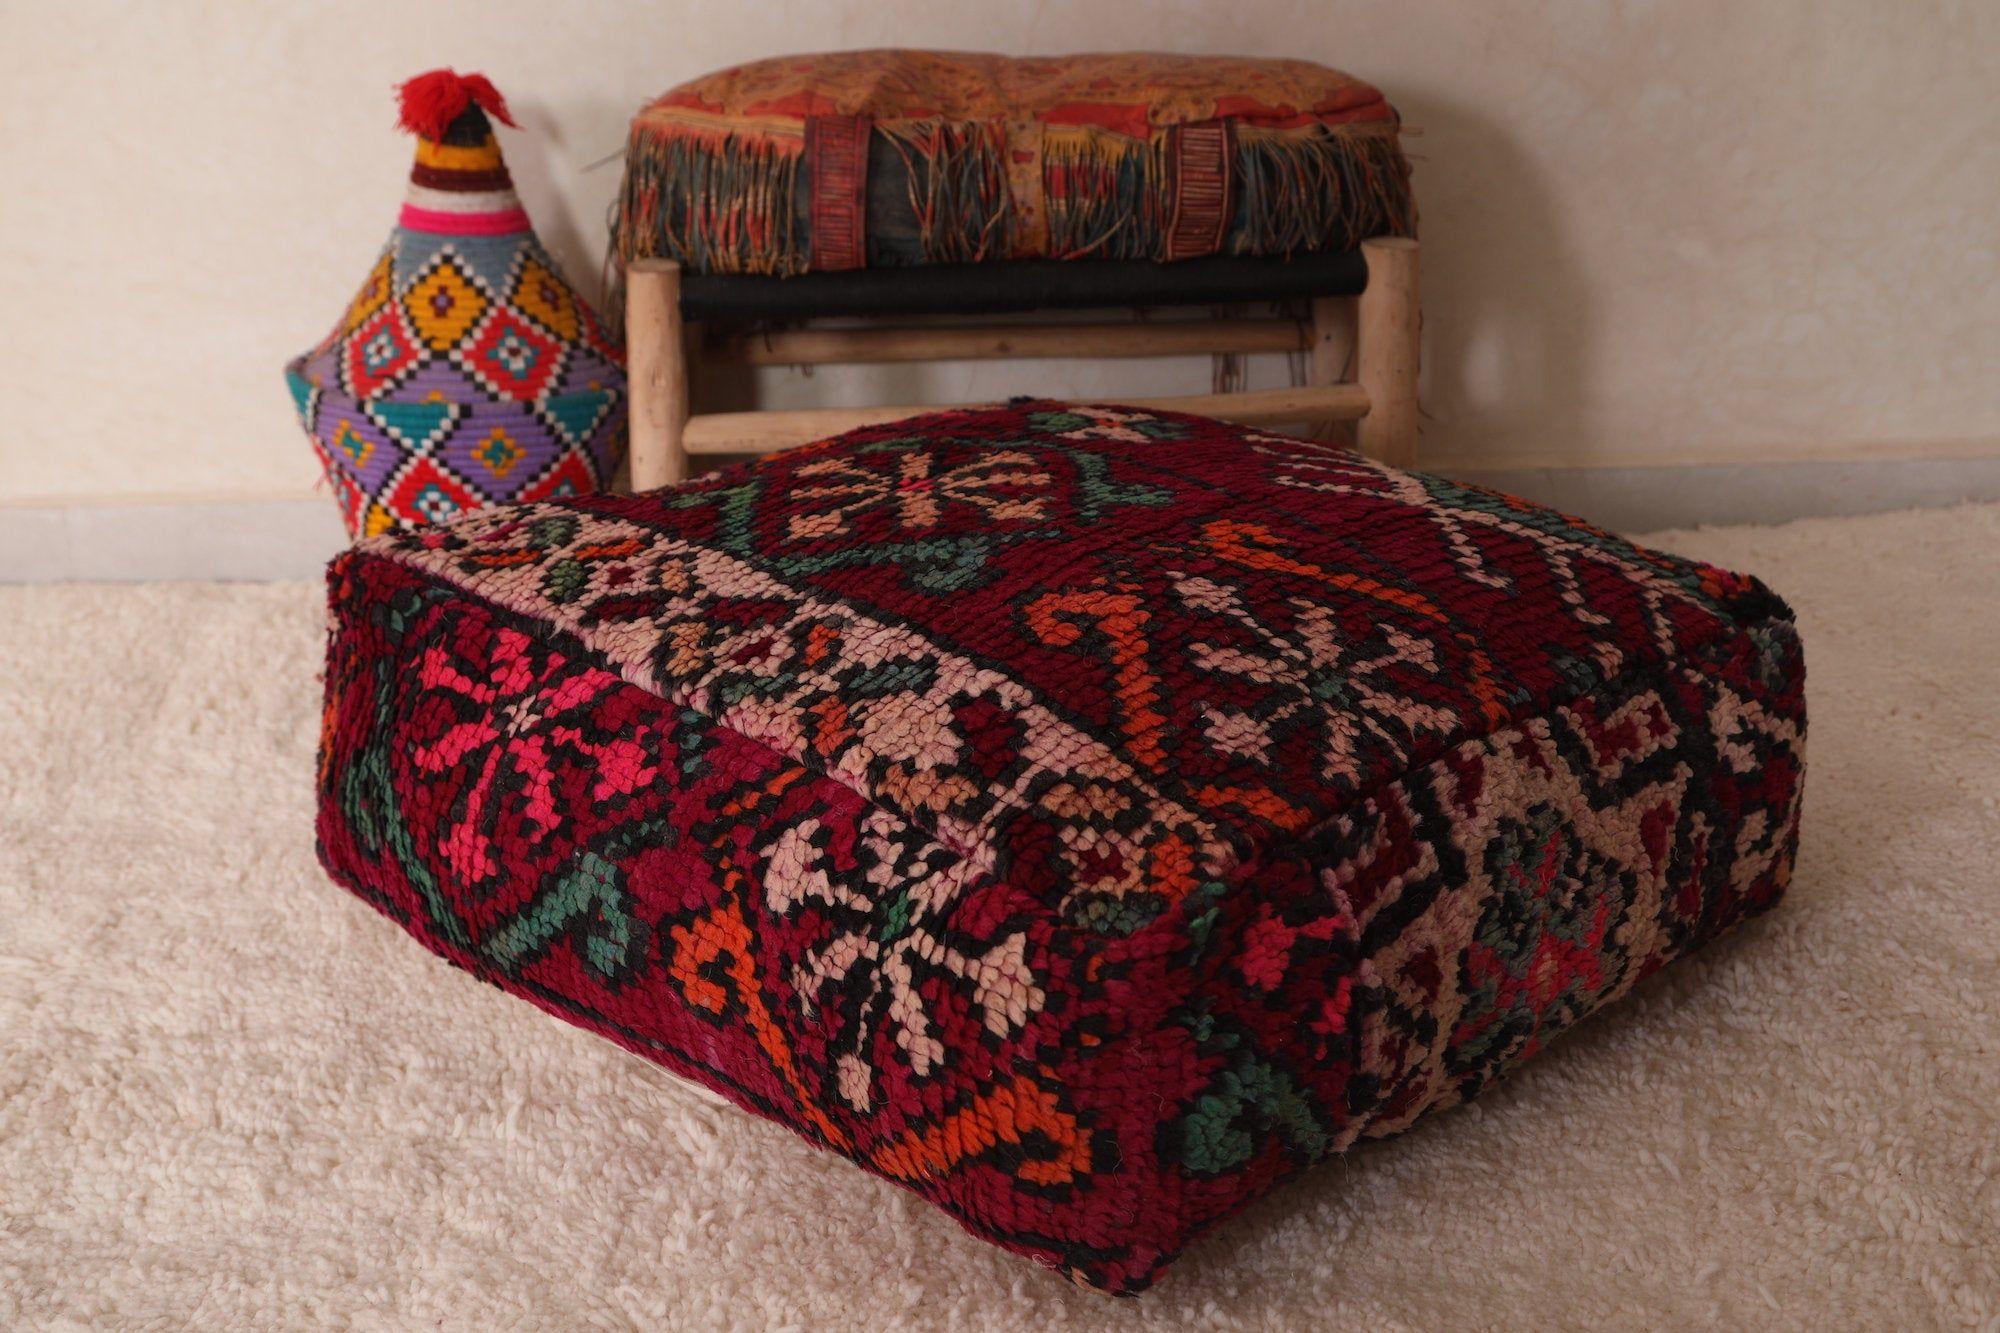 ottoman pouf square pouf wool pouf handmade pouf Moroccan Ottoman  pouf Pillow from Hand Woven Berber rugs and carpets moroccan pouf